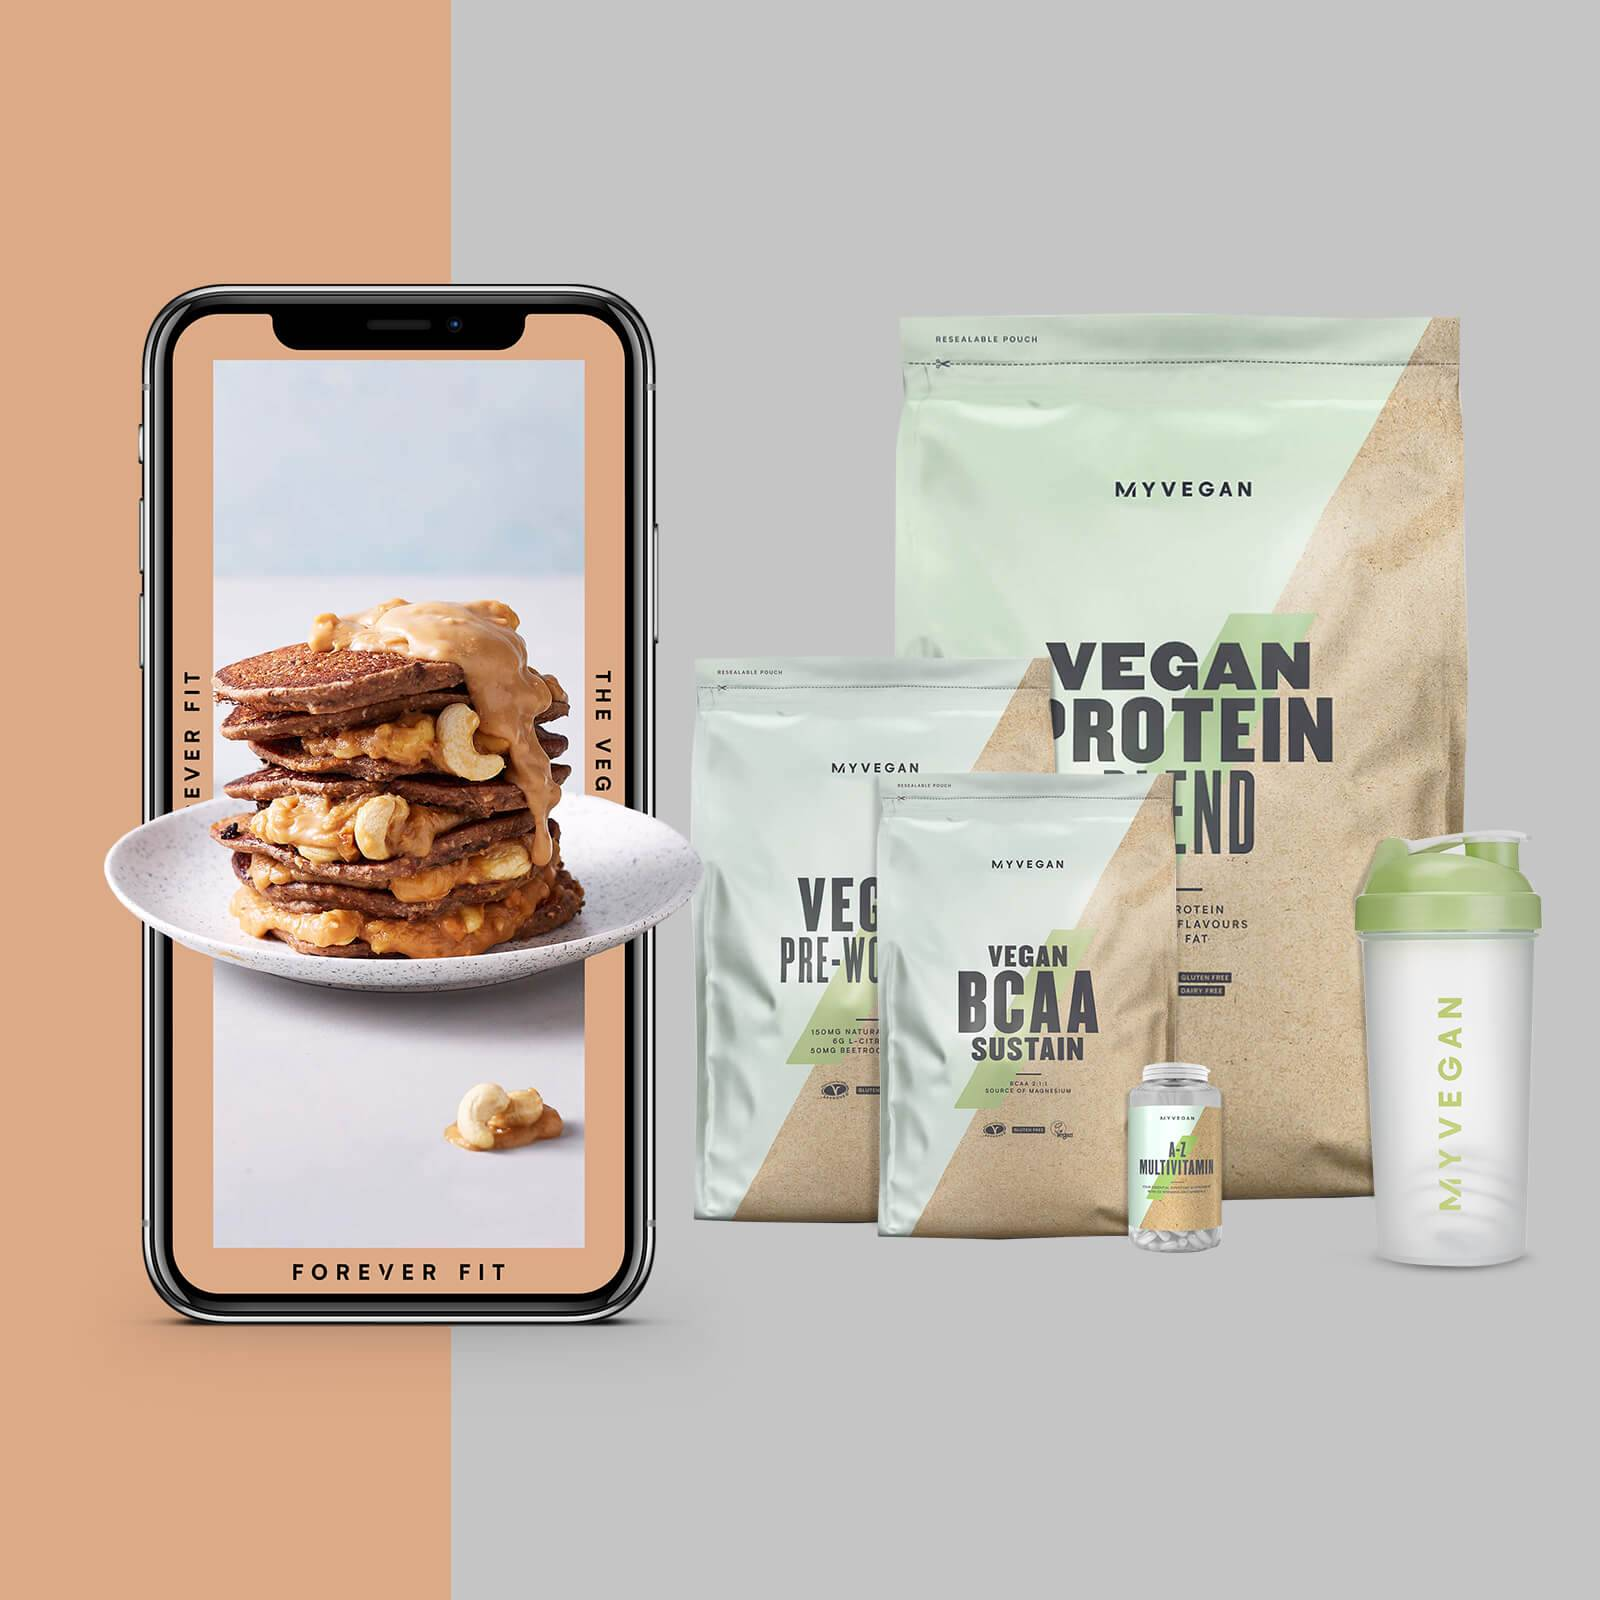 Le Pack Vegan + Guide Entraînement et Nutrition Offert - Orange - Sour Apple - Coffee and Walnut